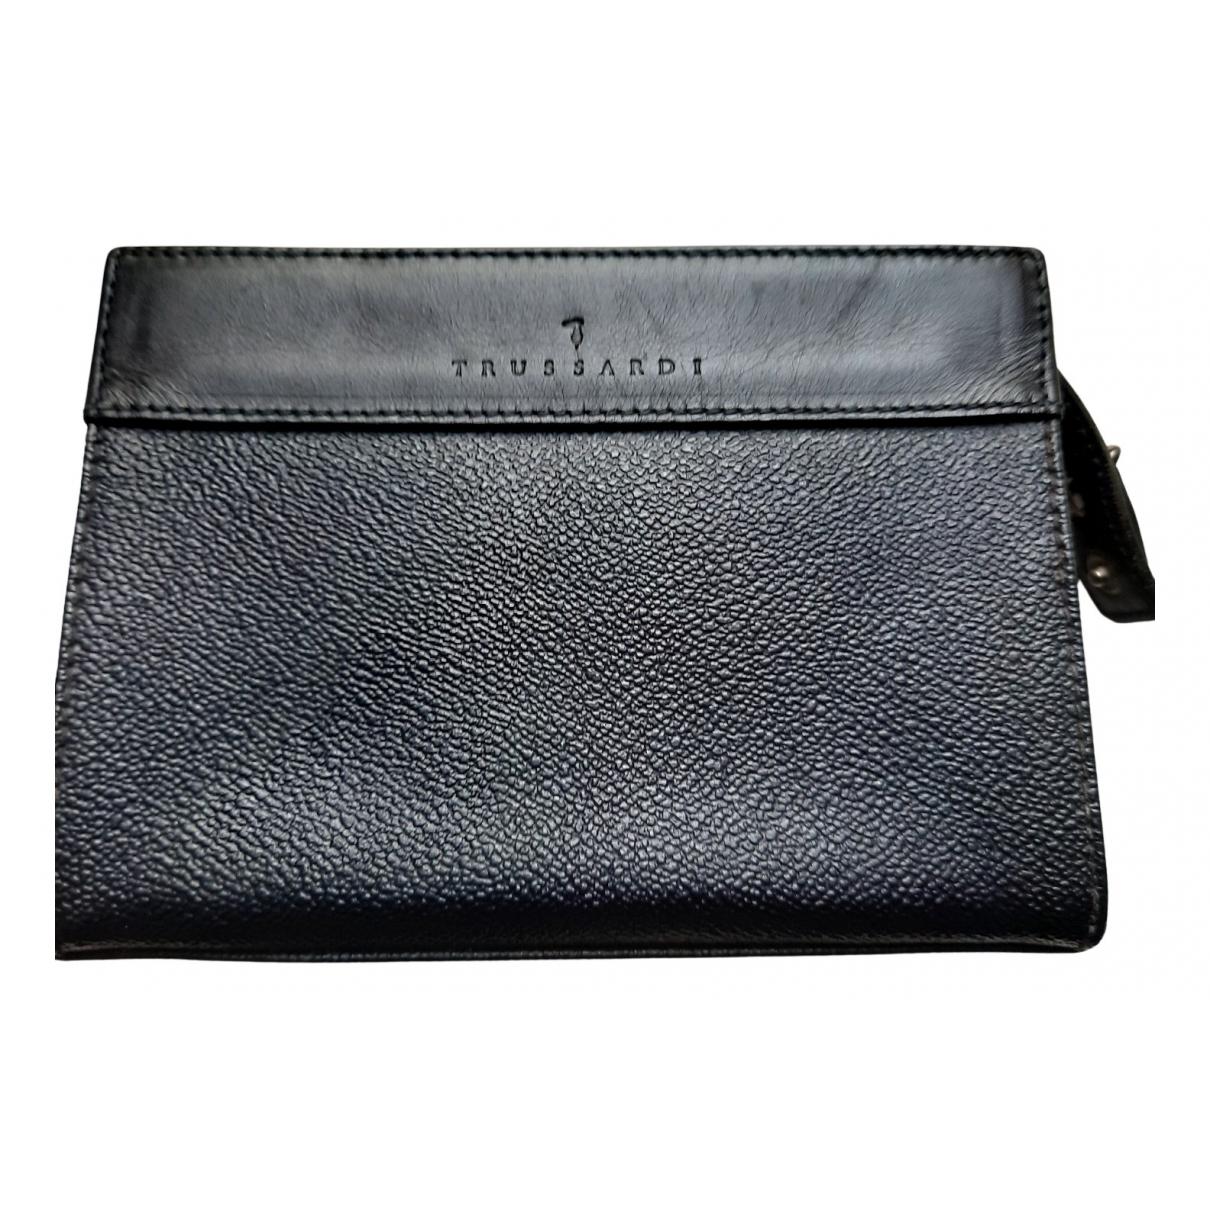 Trussardi N Blue Leather Purses, wallet & cases for Women N